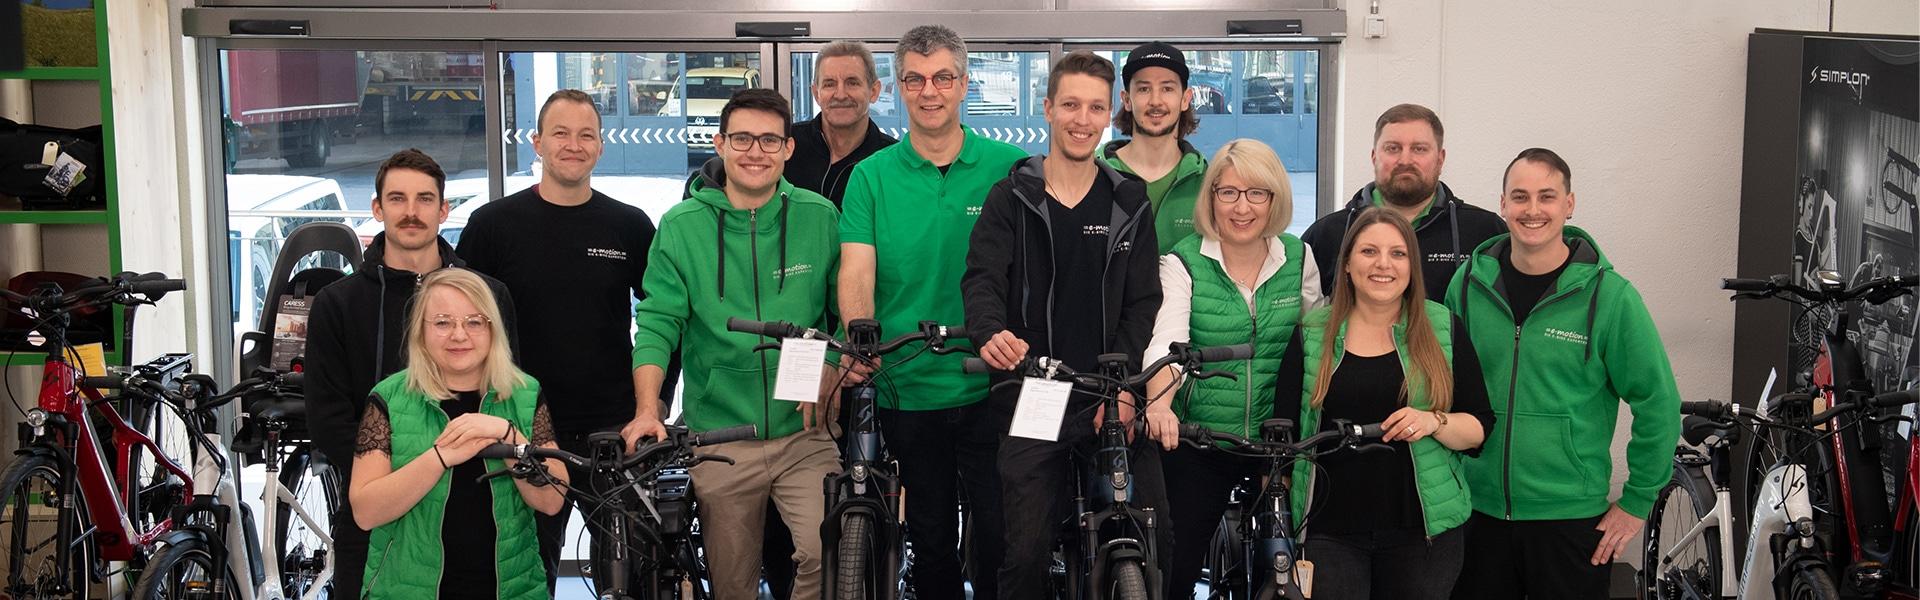 Das Team der e-motion e-Bike Welt Dietikon